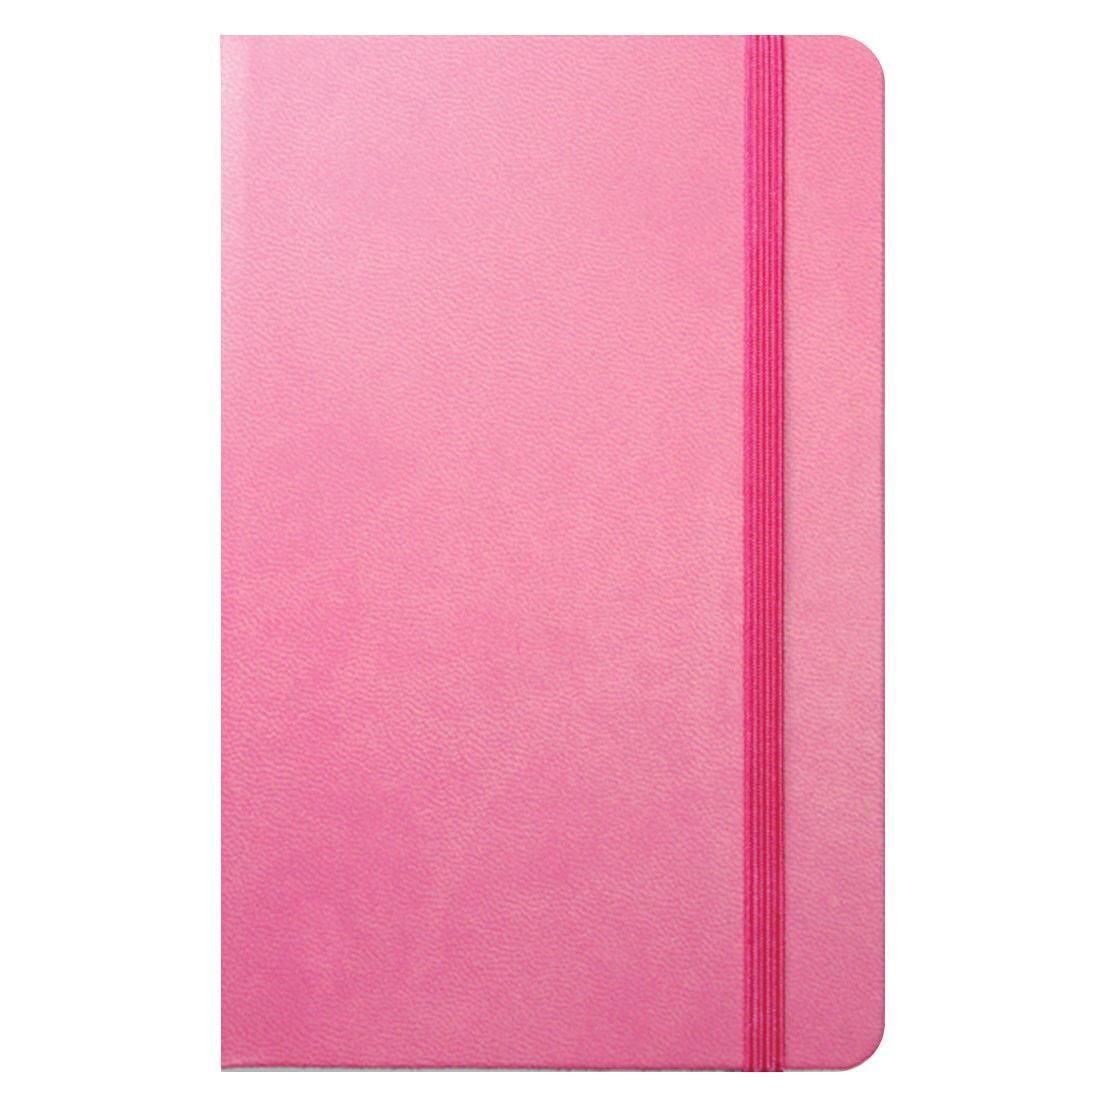 Flexi Pocket Ruled Notebook - Pink